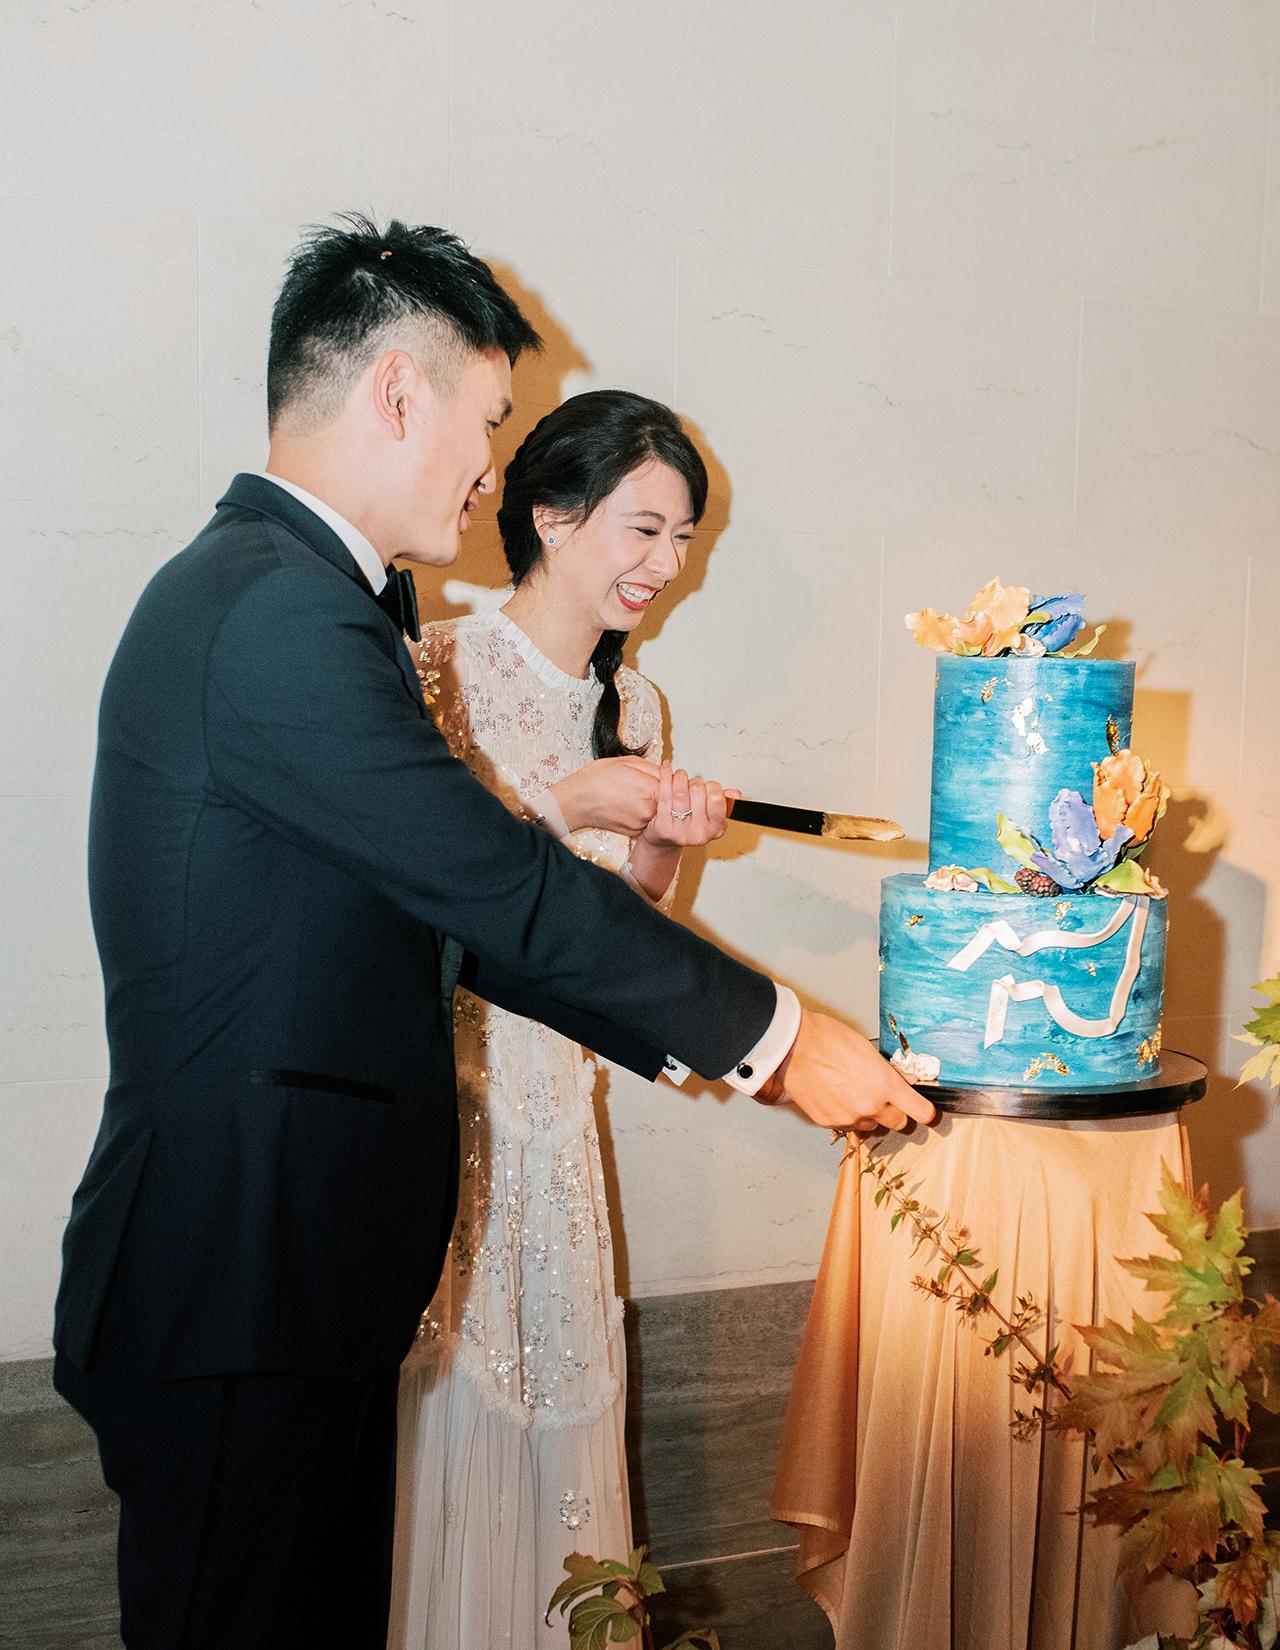 bride groom cutting blue two-tier wedding cake